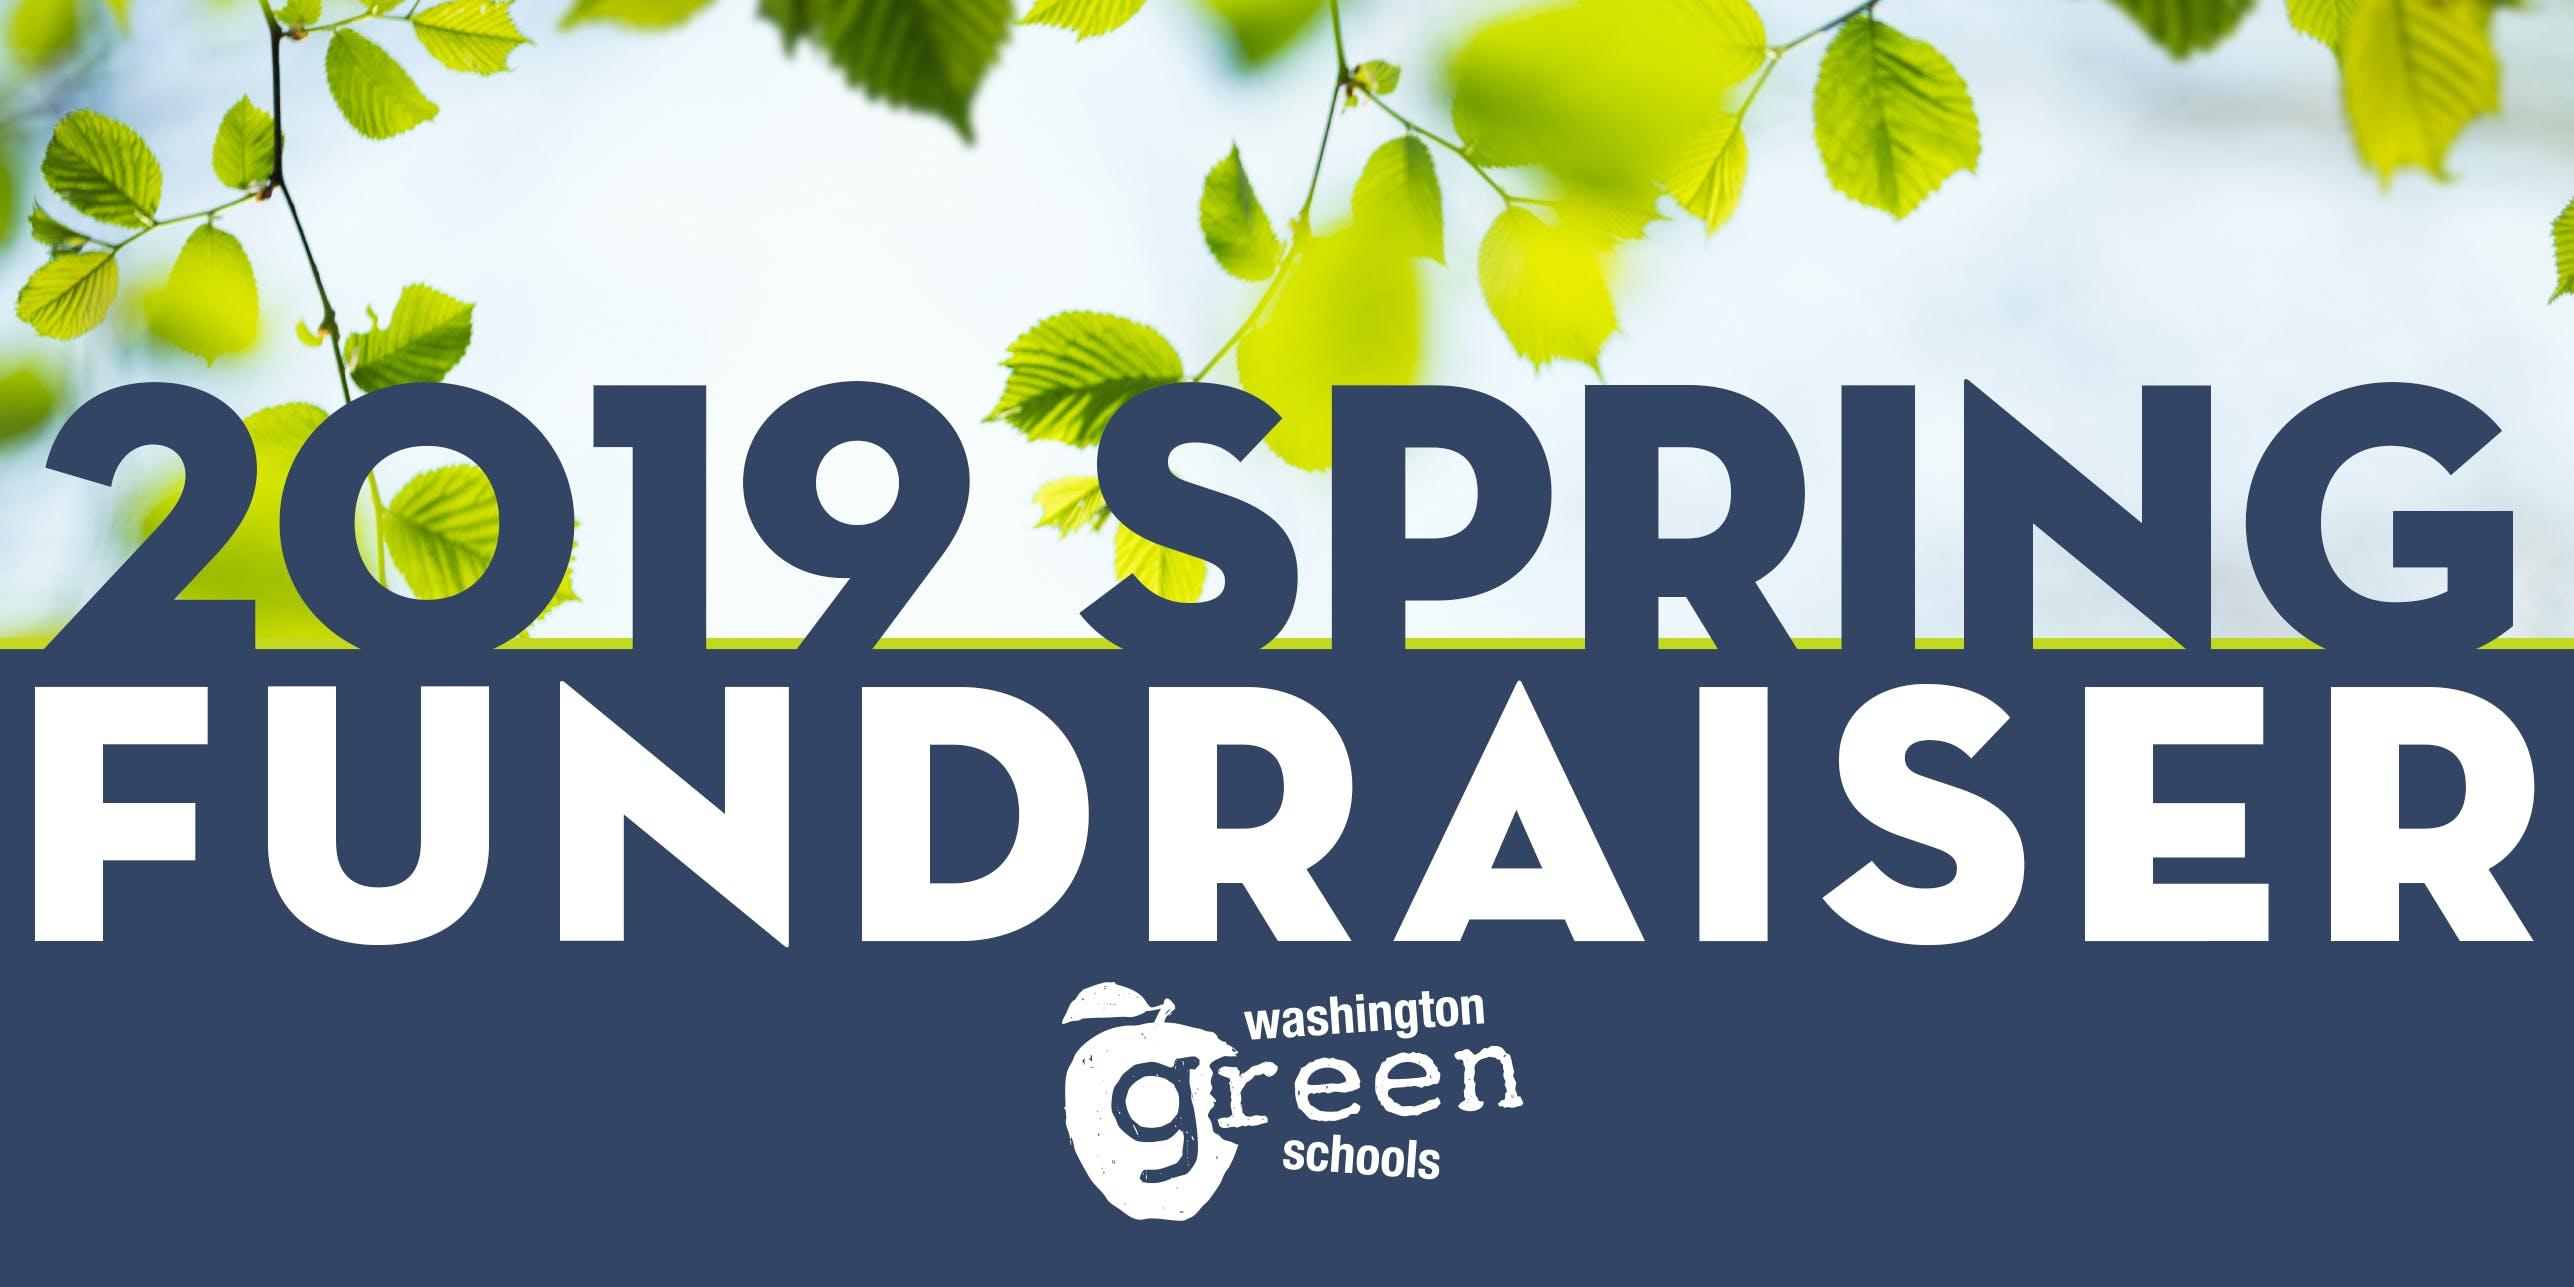 Washington Green Schools: 2019 Annual Fundrai